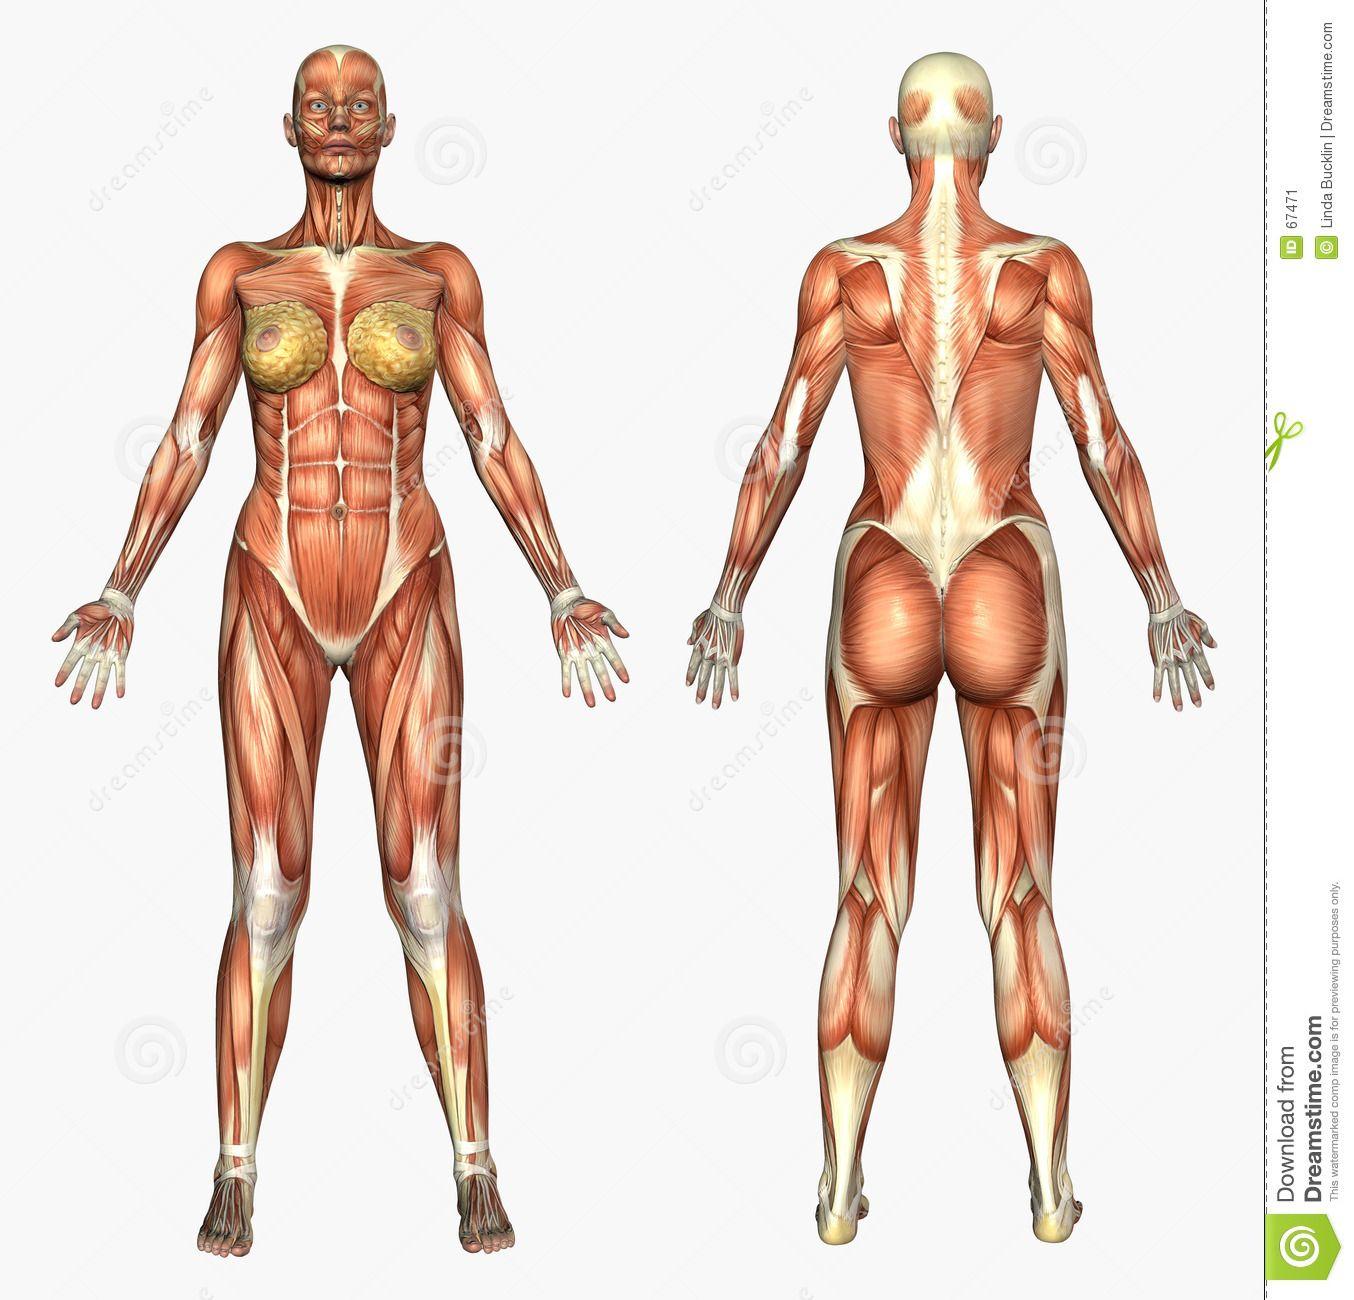 woman anatomy drawing gallery - learn human anatomy image, Human Body